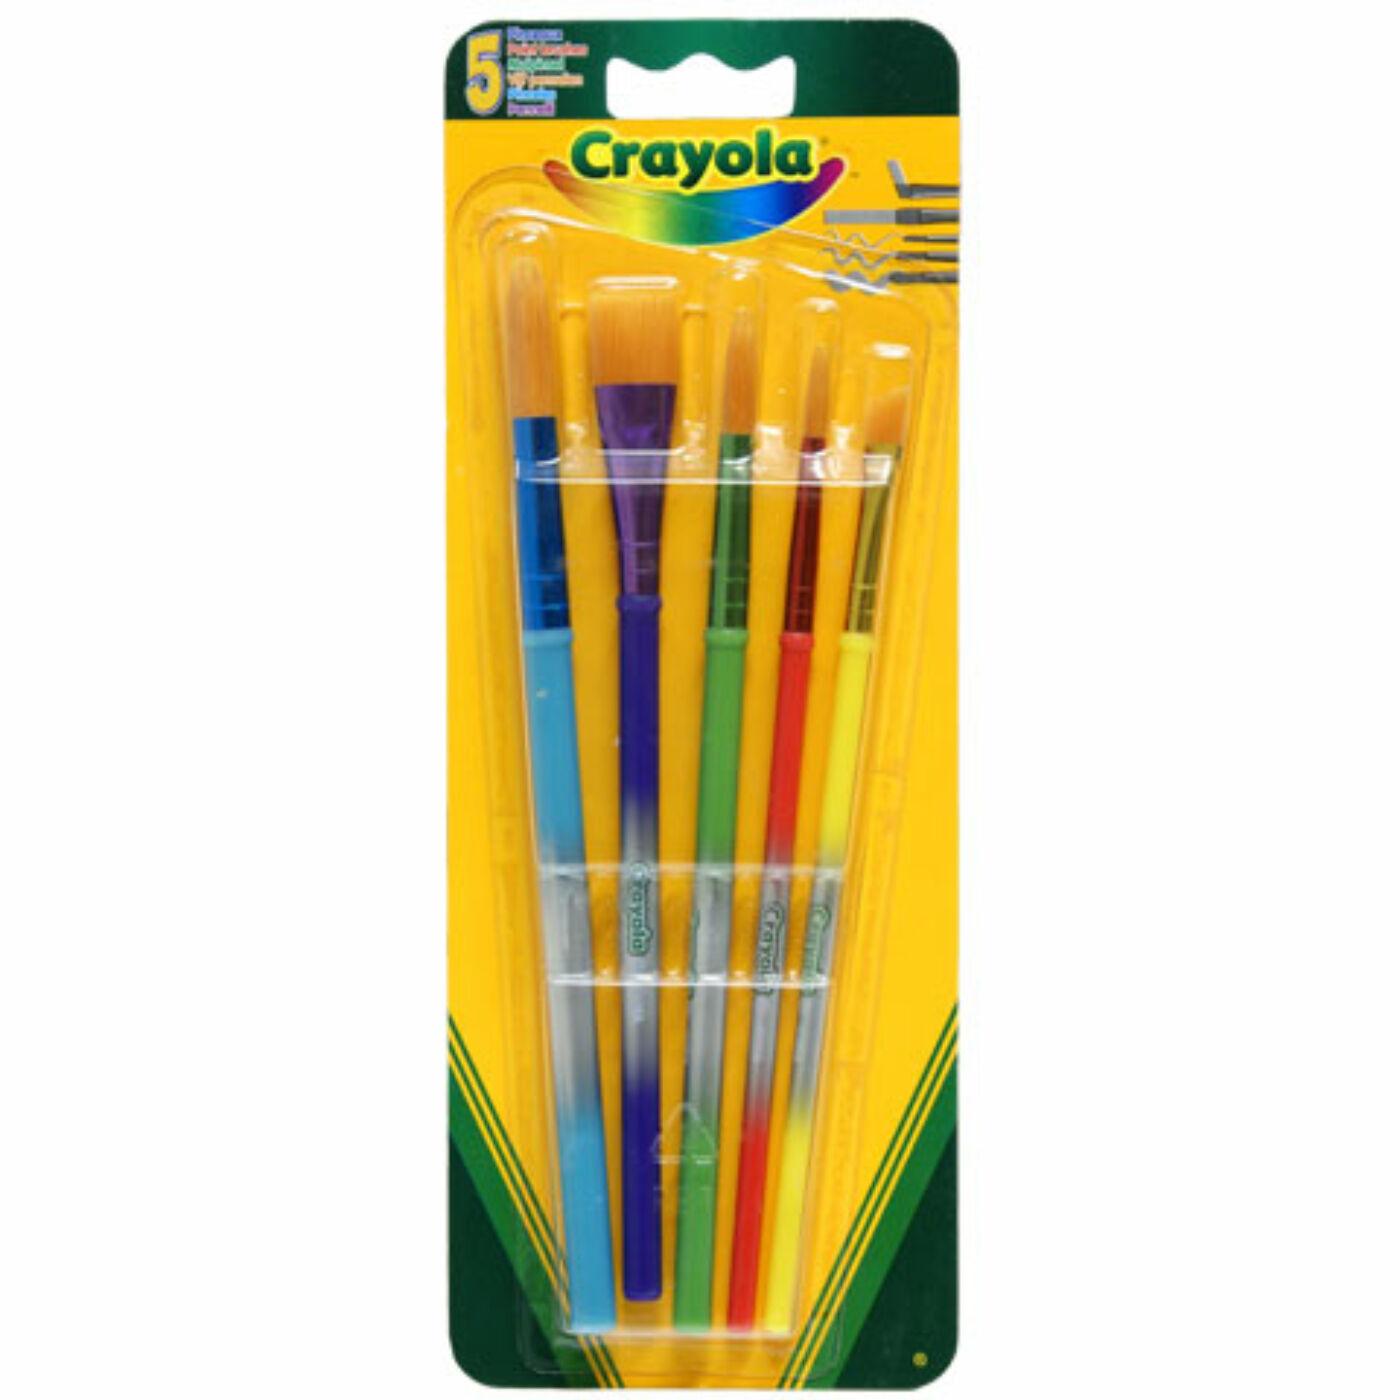 Crayola standard ecset